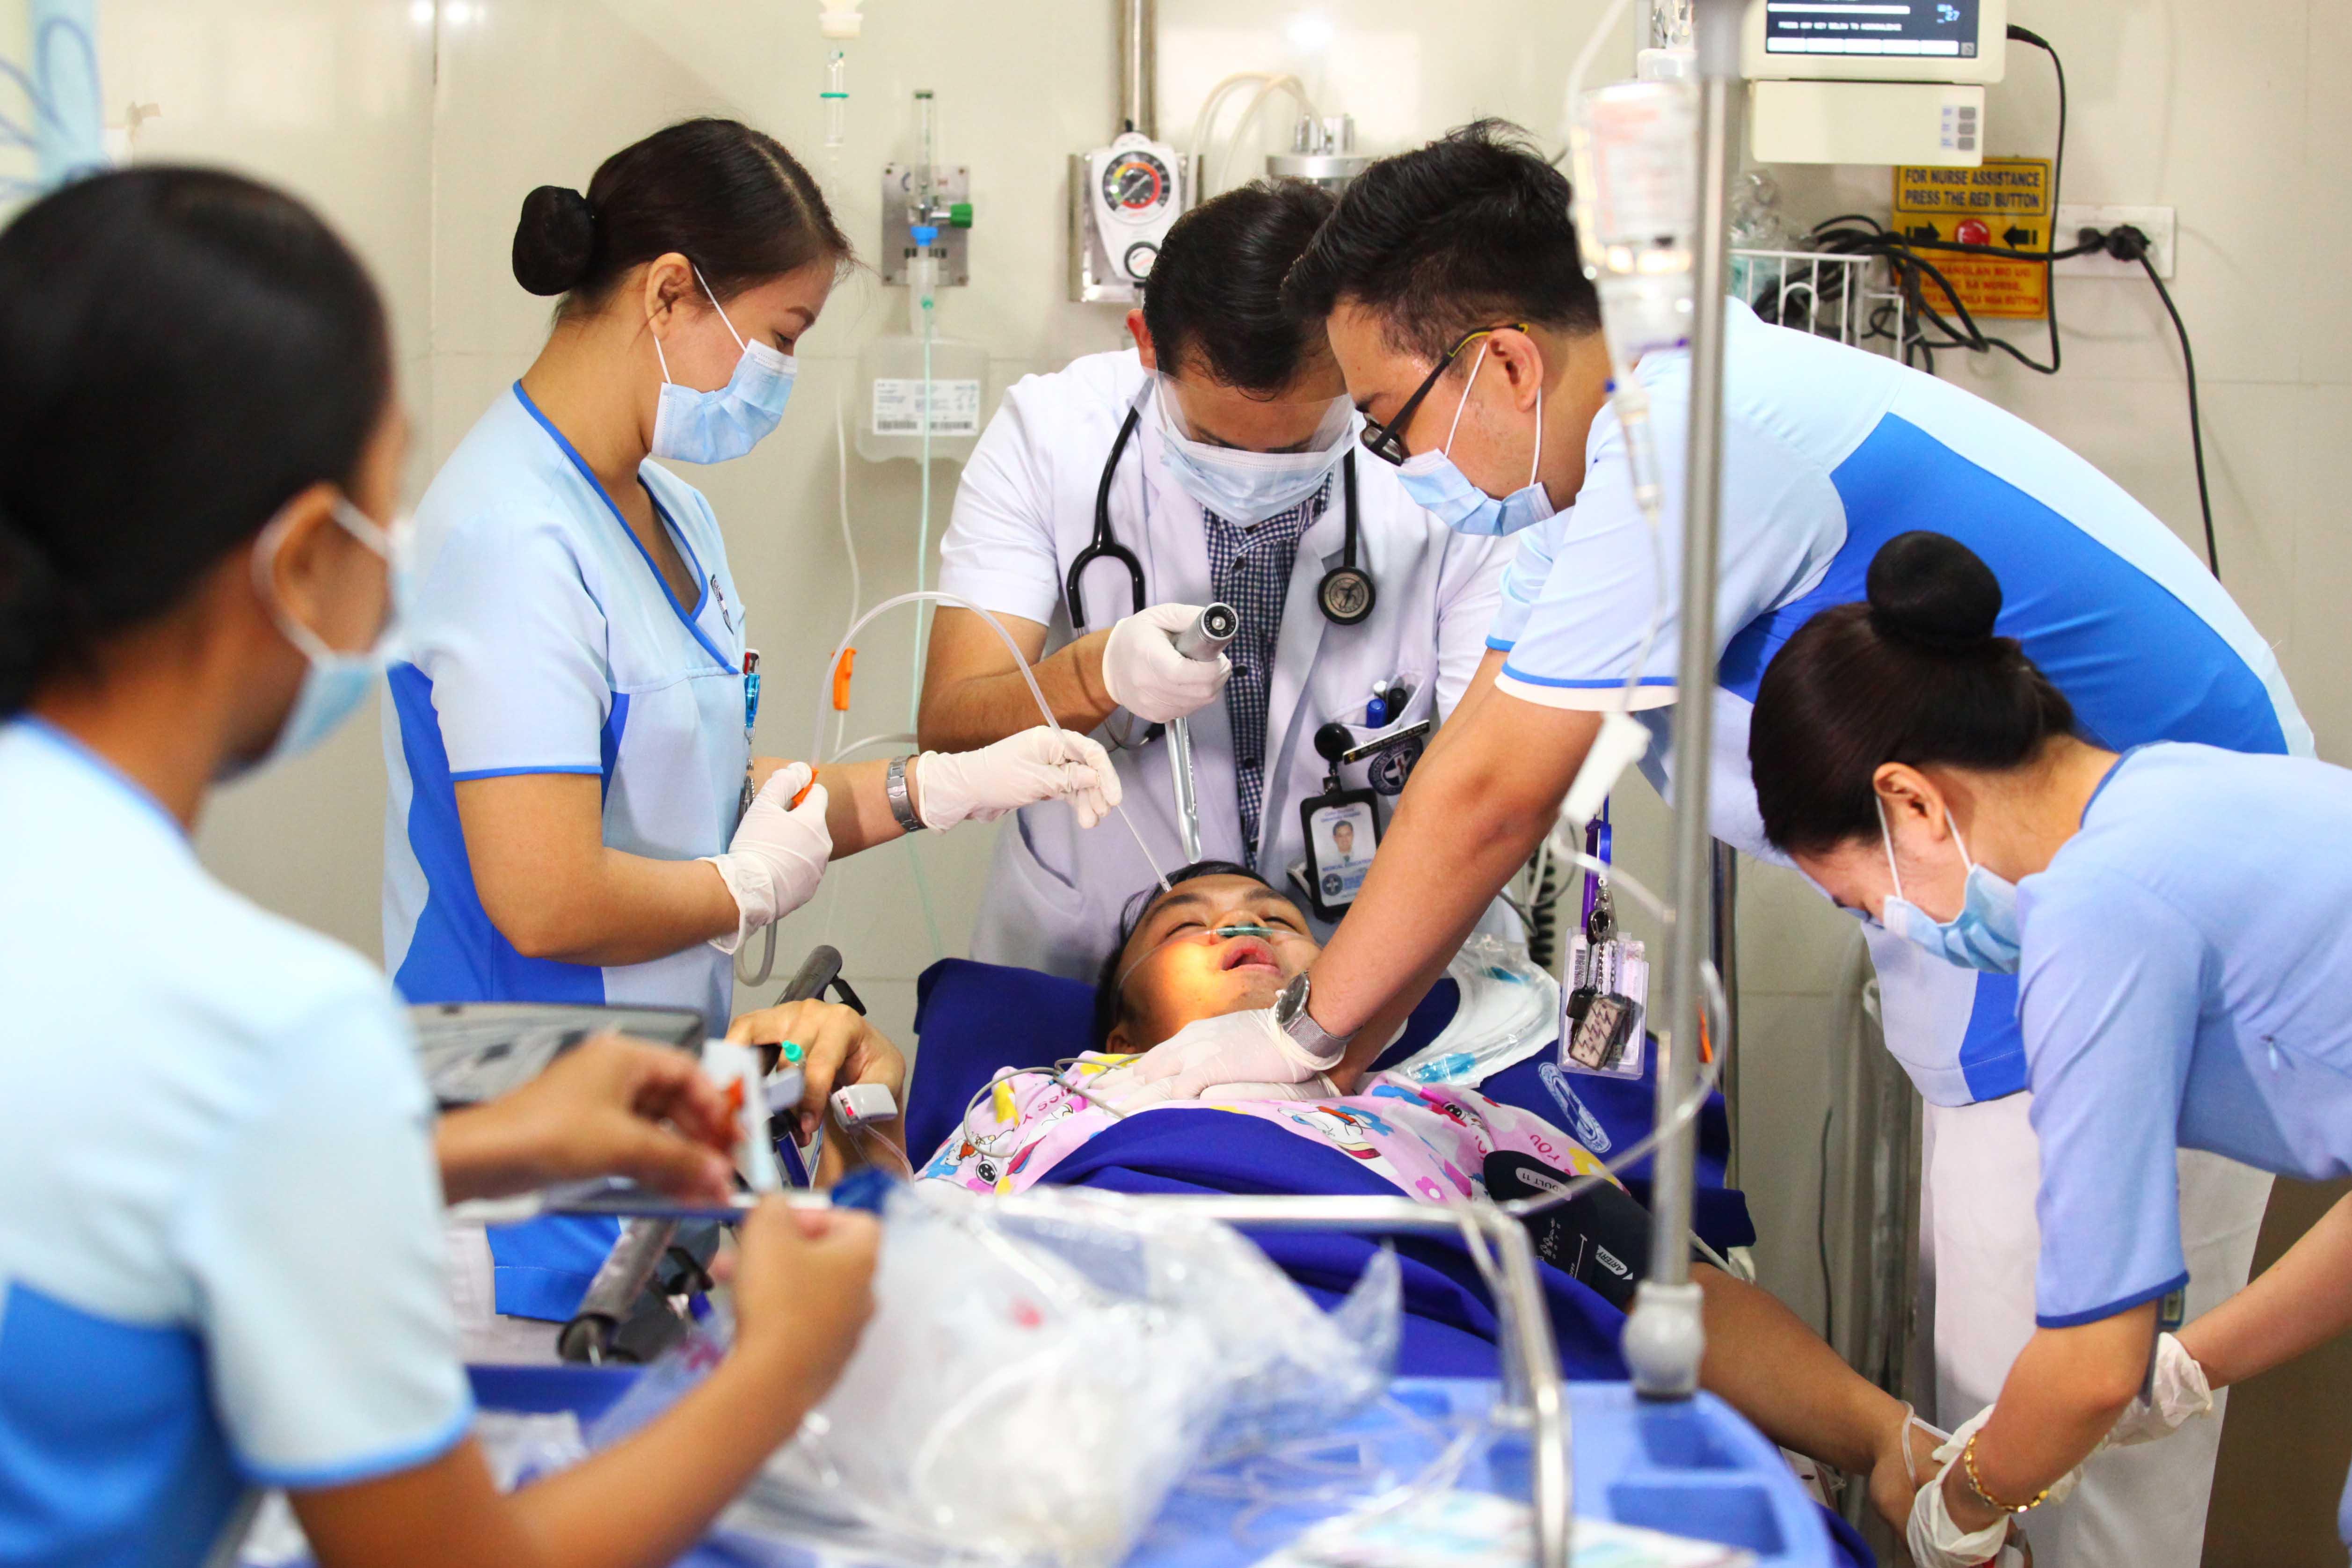 er nursing Product features national nurses week 2018 t-shirt, national nurses week 2018 shirt, nurse shirt.